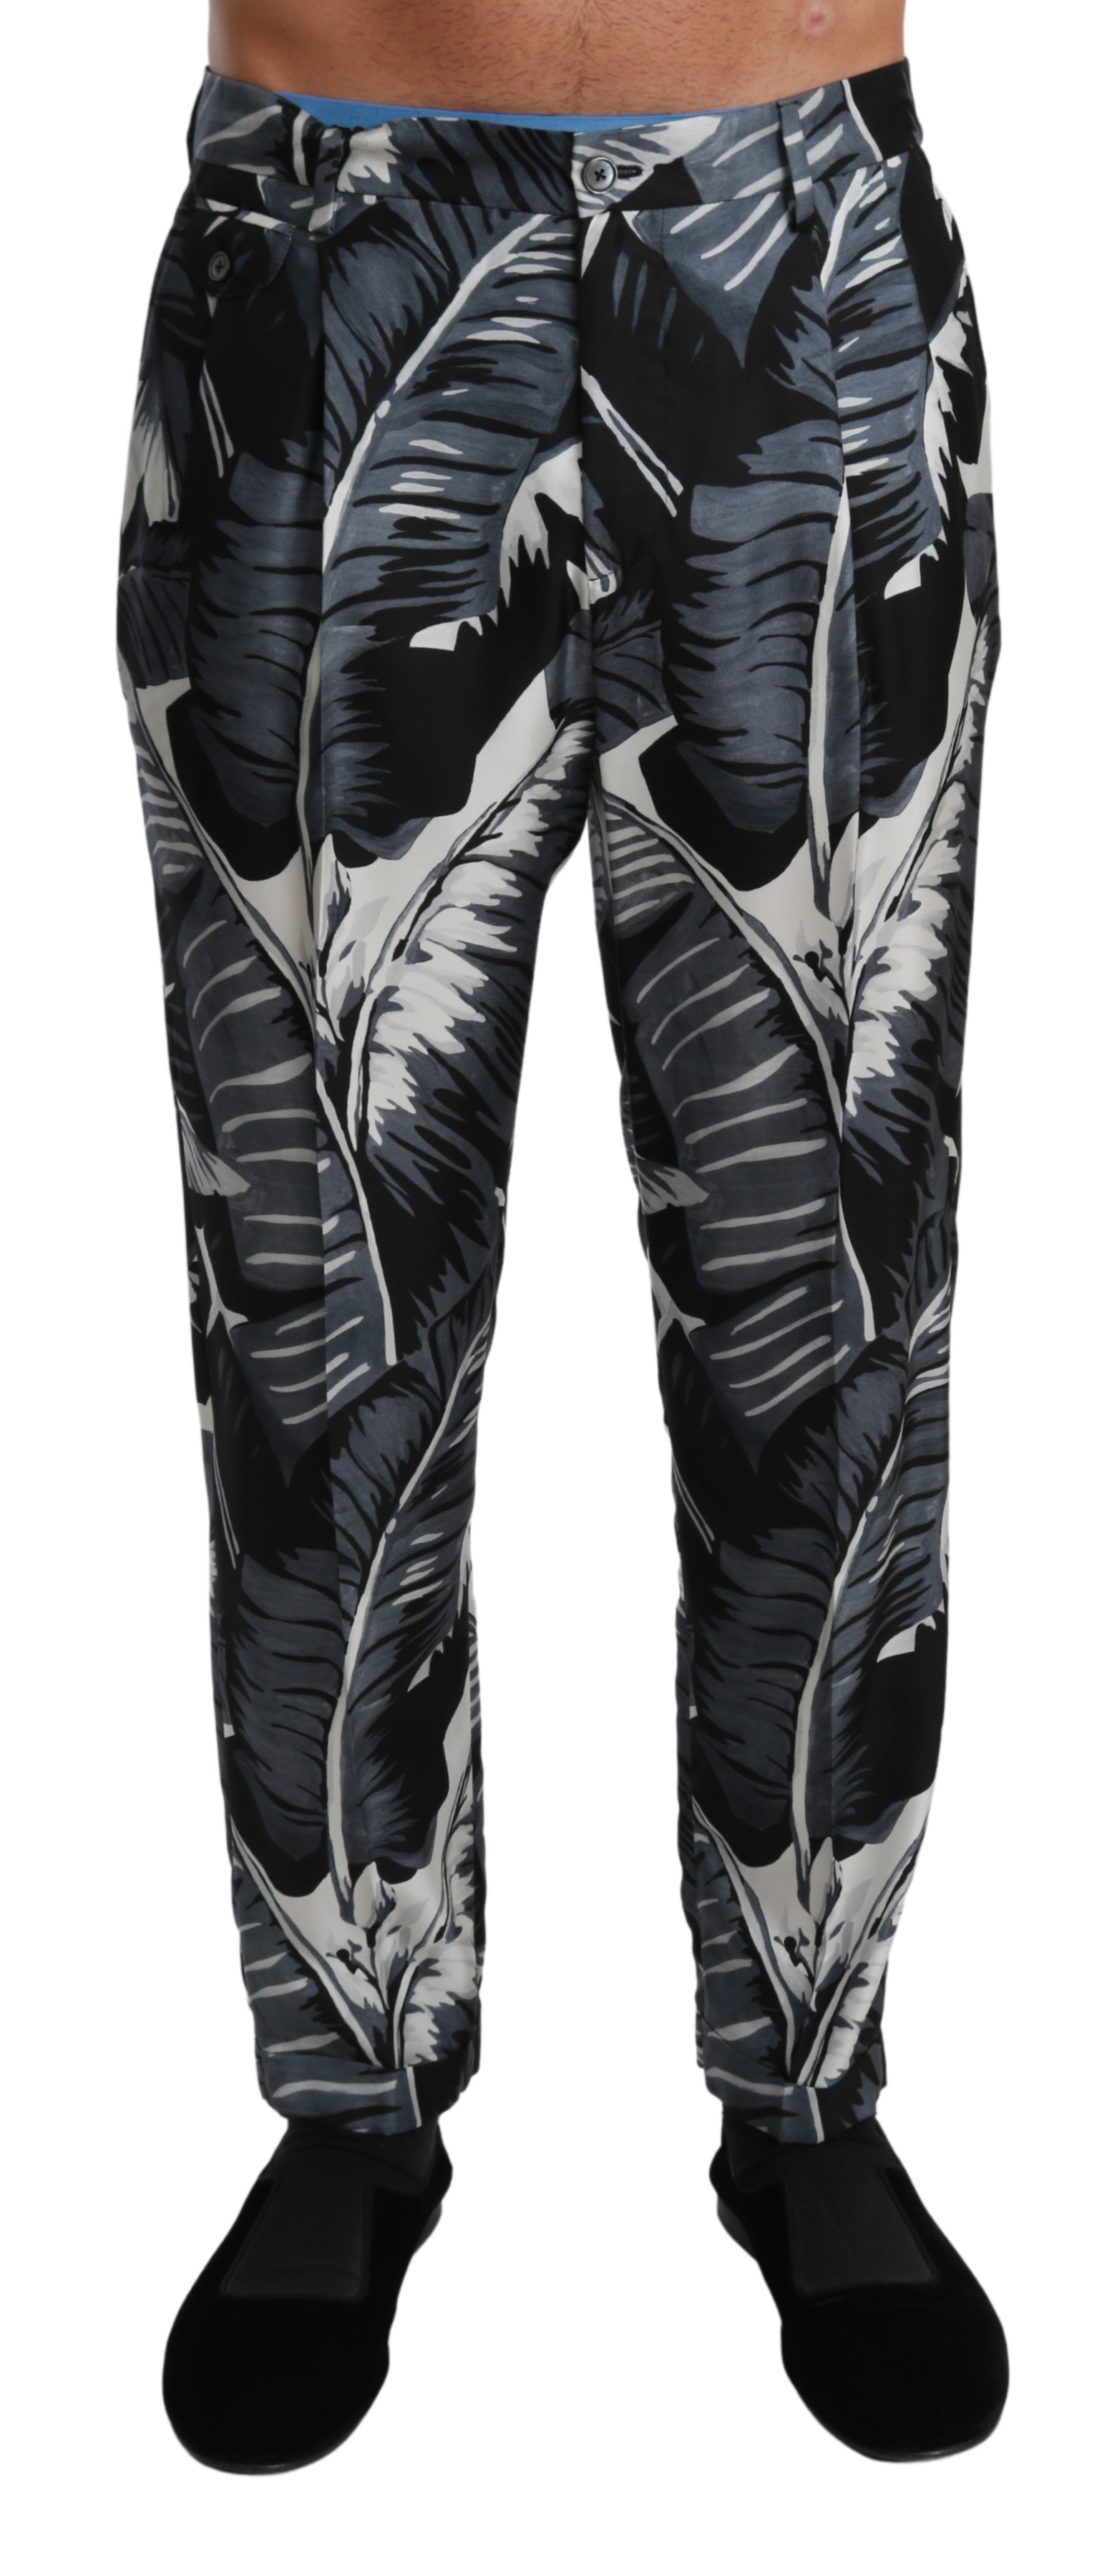 Dolce & Gabbana Men's Banana Leaf Casual Silk Trouser Black PAN71019 - IT46   S